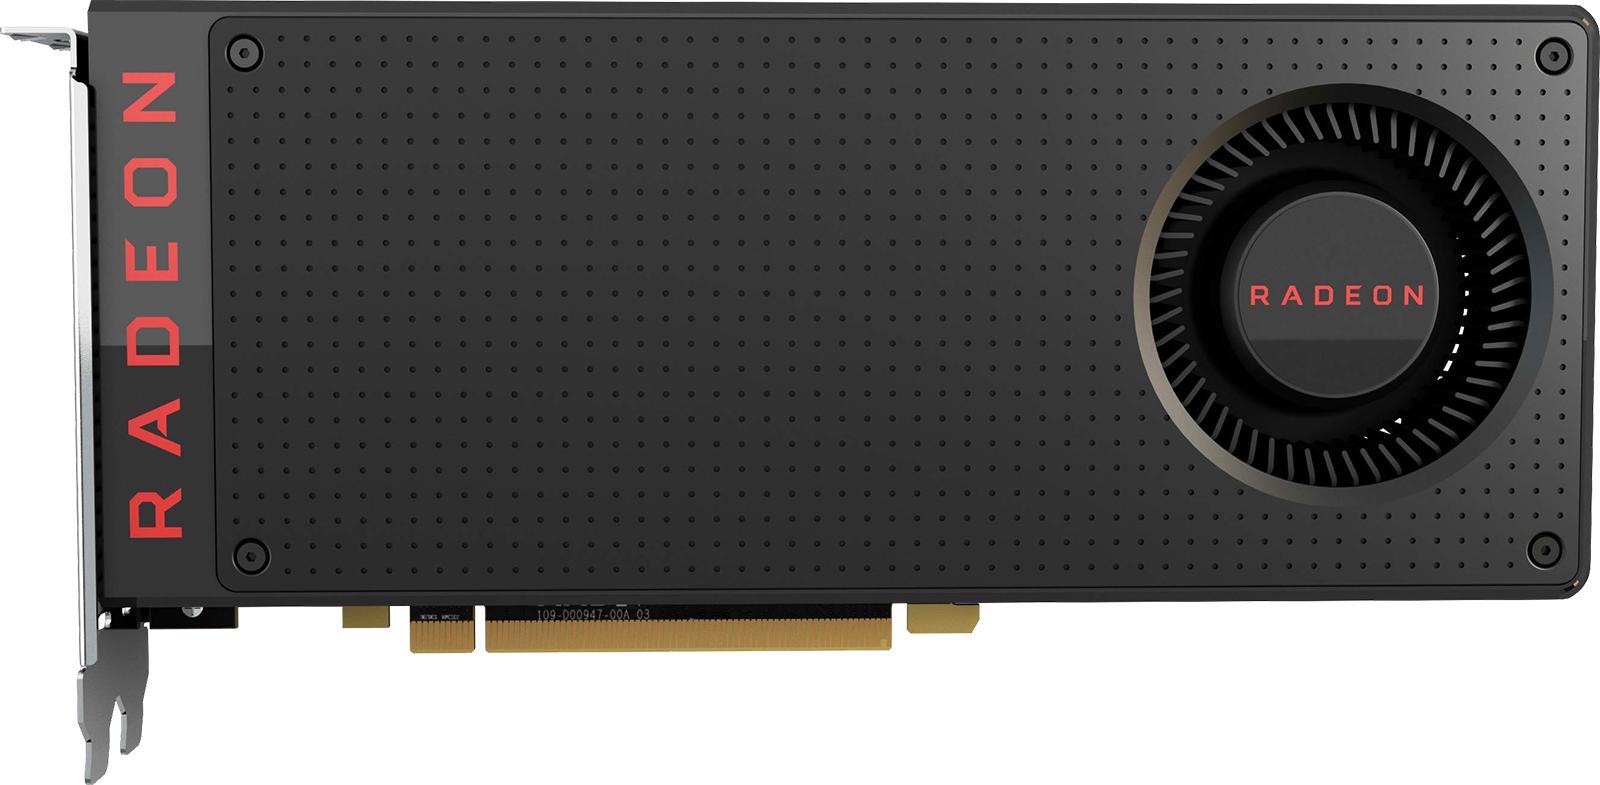 Gigabyte Radeon RX 480